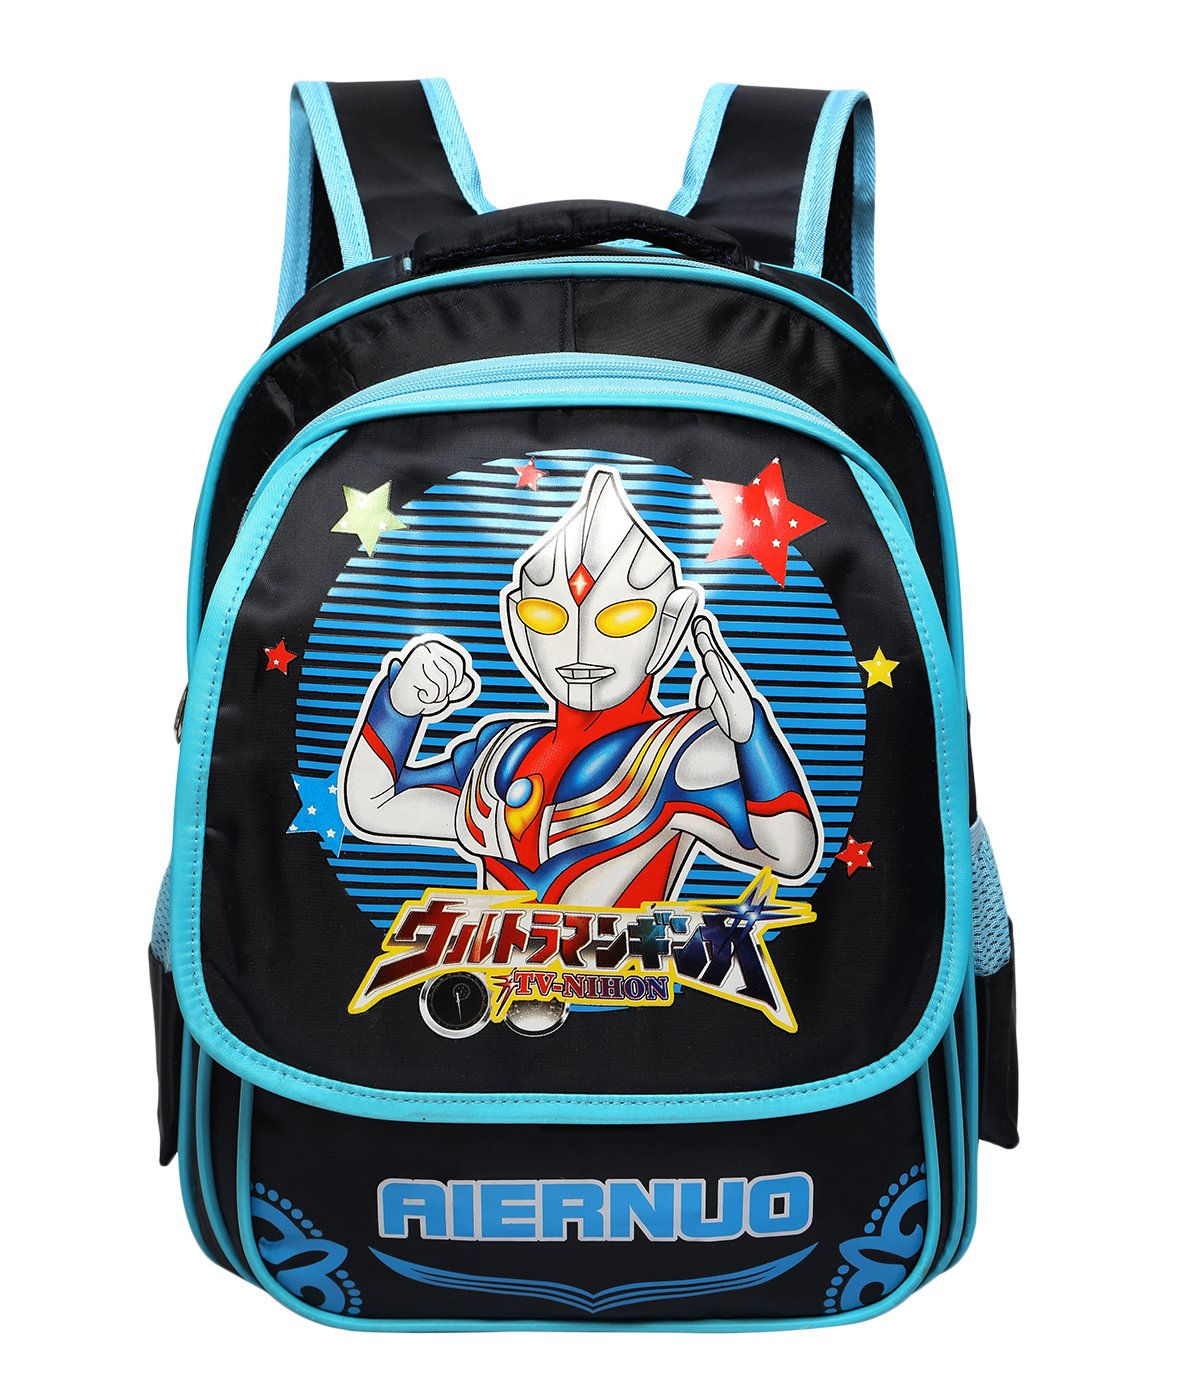 Buy Offspring Kids School Bag, Black Online at Low Prices in